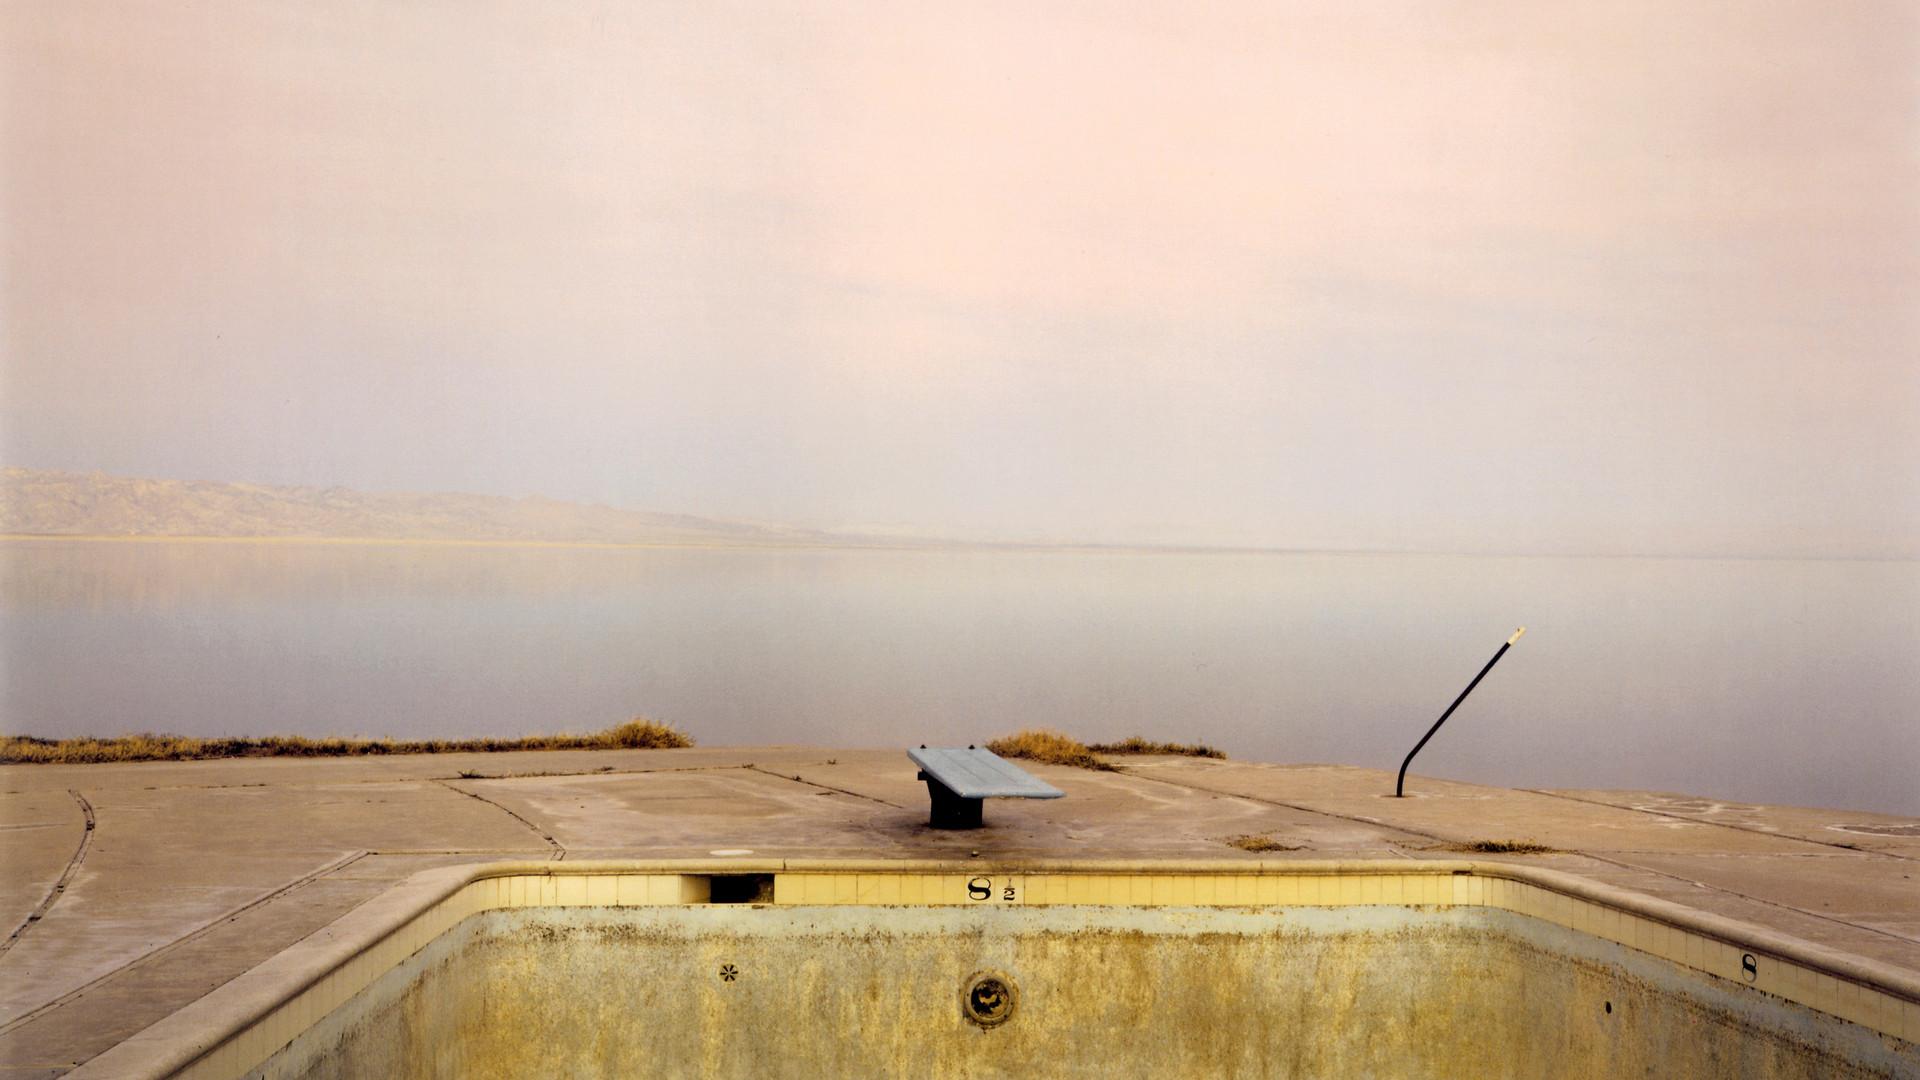 Richard Misrach, Diving Board, Salton Sea, 1983